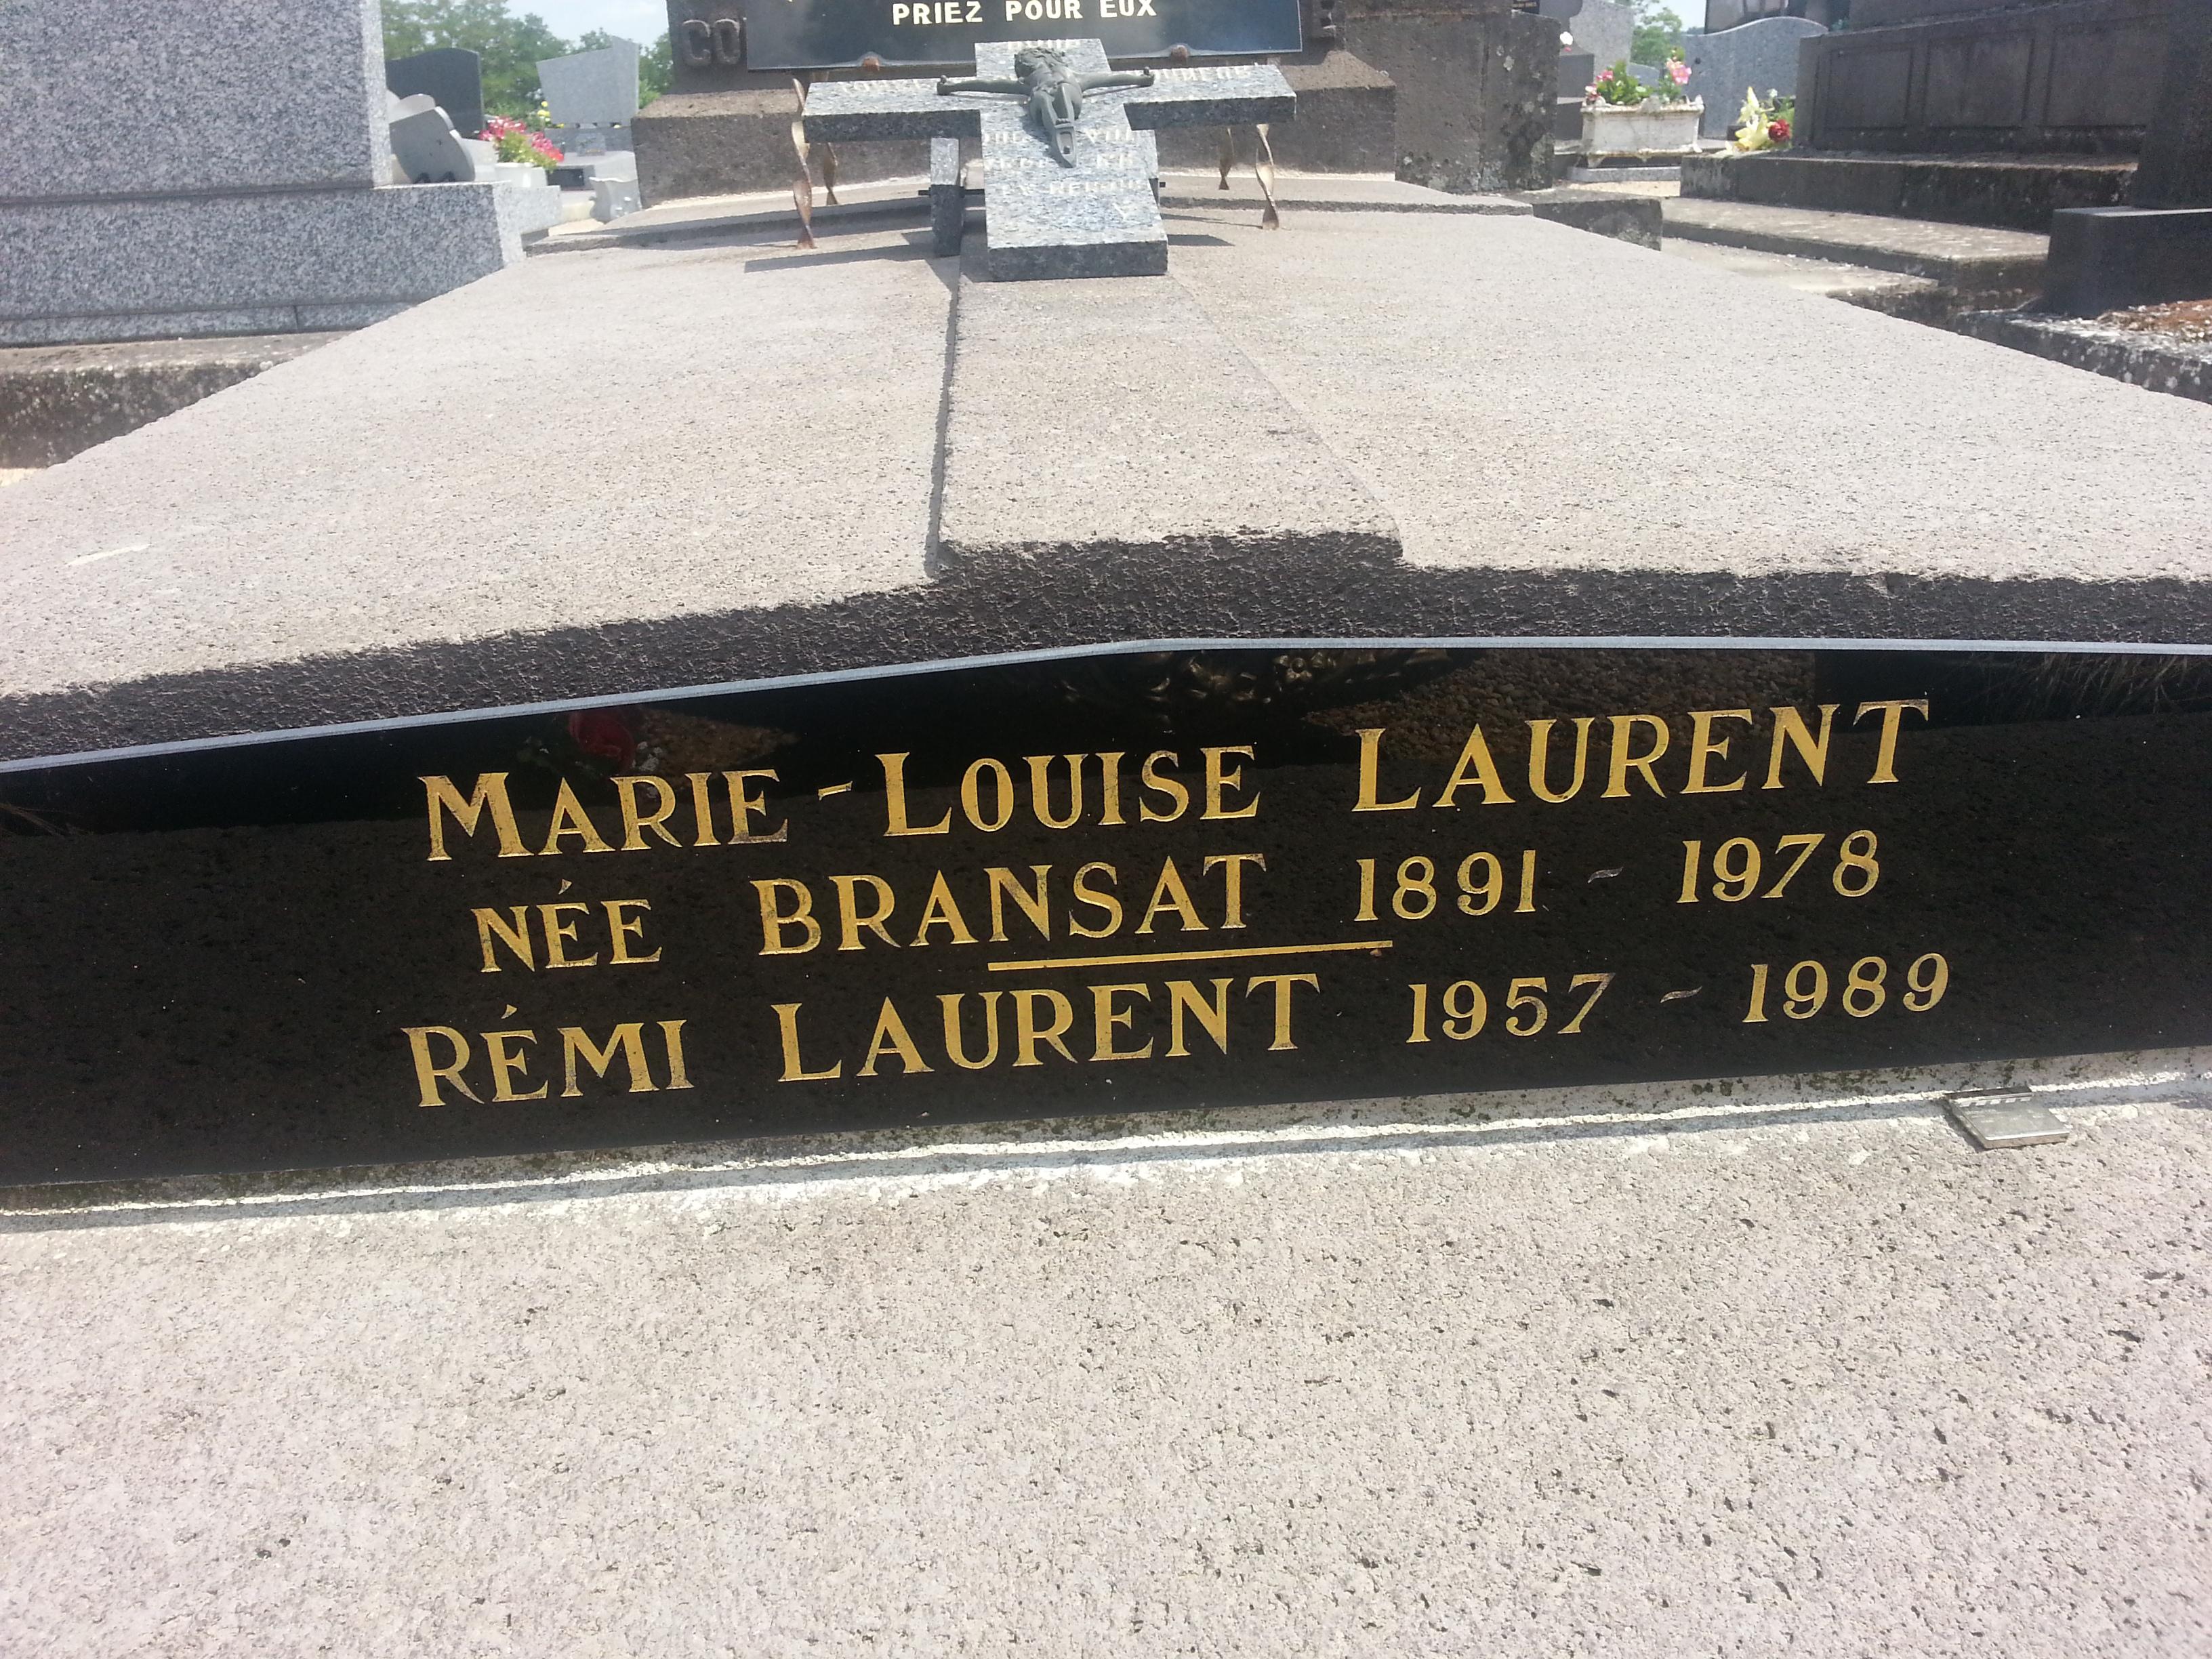 Photo Rémi Laurent via Opendata BNF